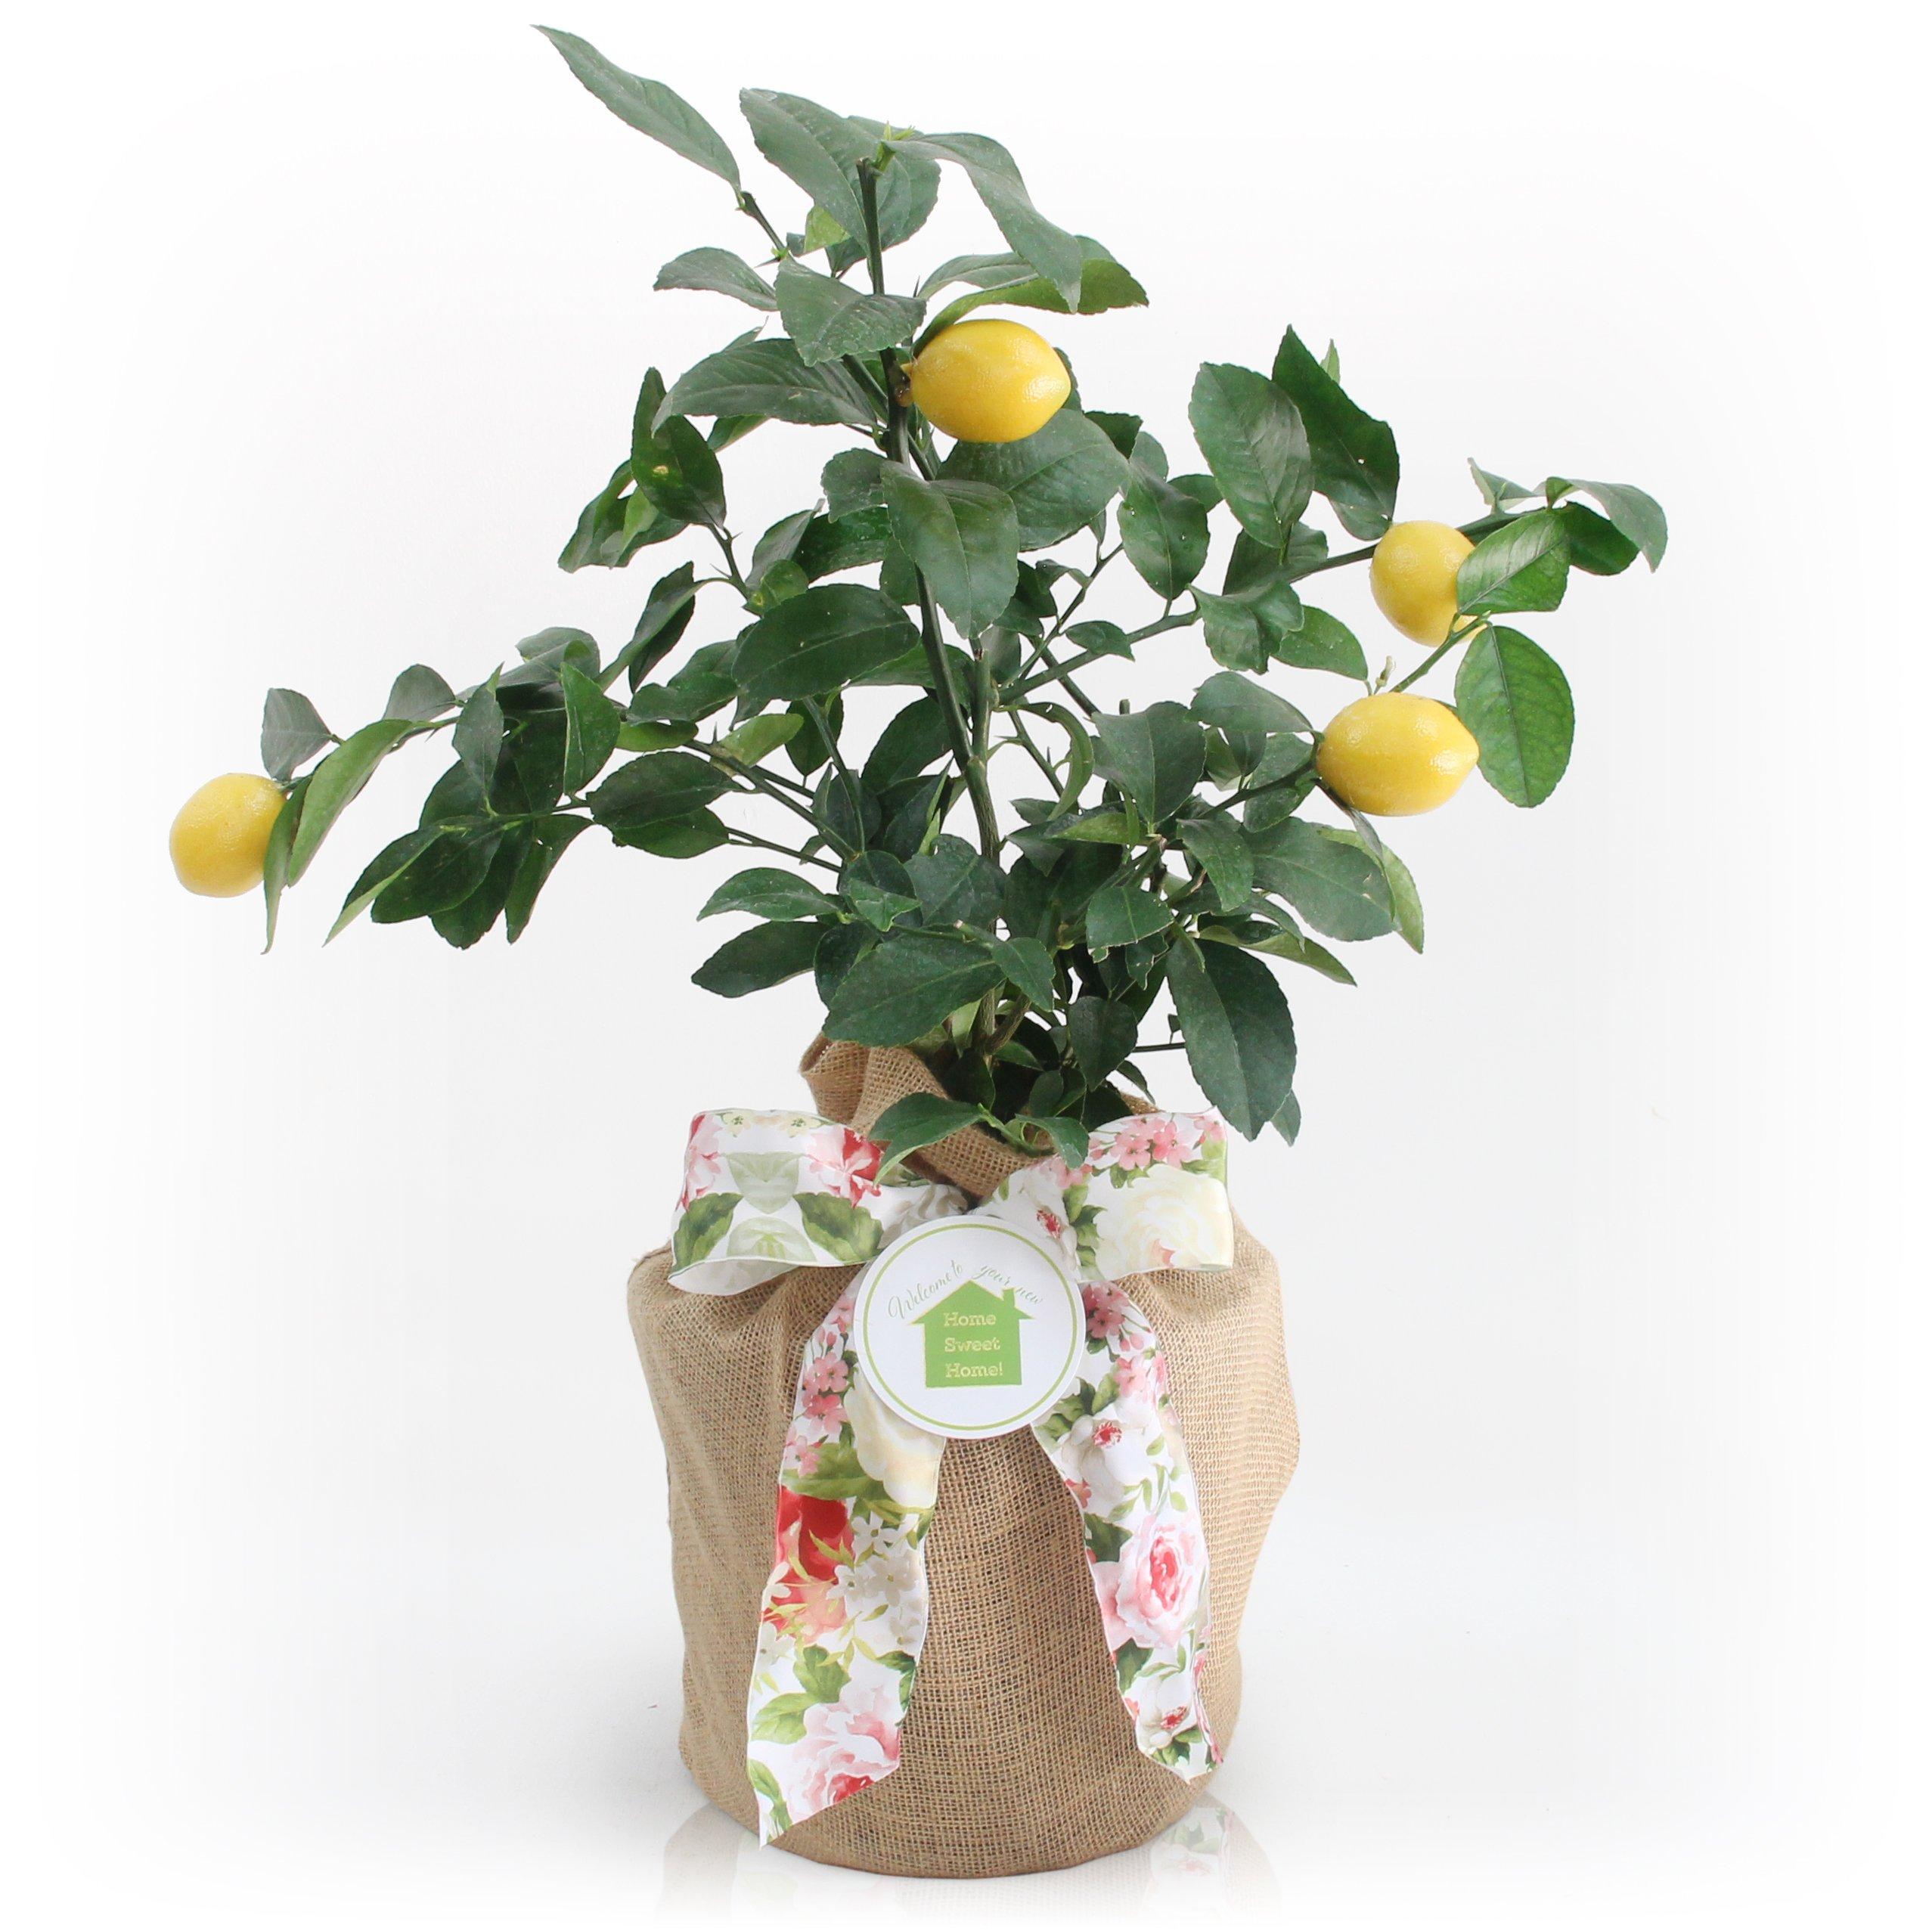 Housewarming Meyer Lemon Gift Tree by The Magnolia Company - Get Fruit 1st Year, Dwarf Fruit Tree with Juicy Sweet Lemons, NO Ship to TX, LA, AZ and CA by The Magnolia Company (Image #2)